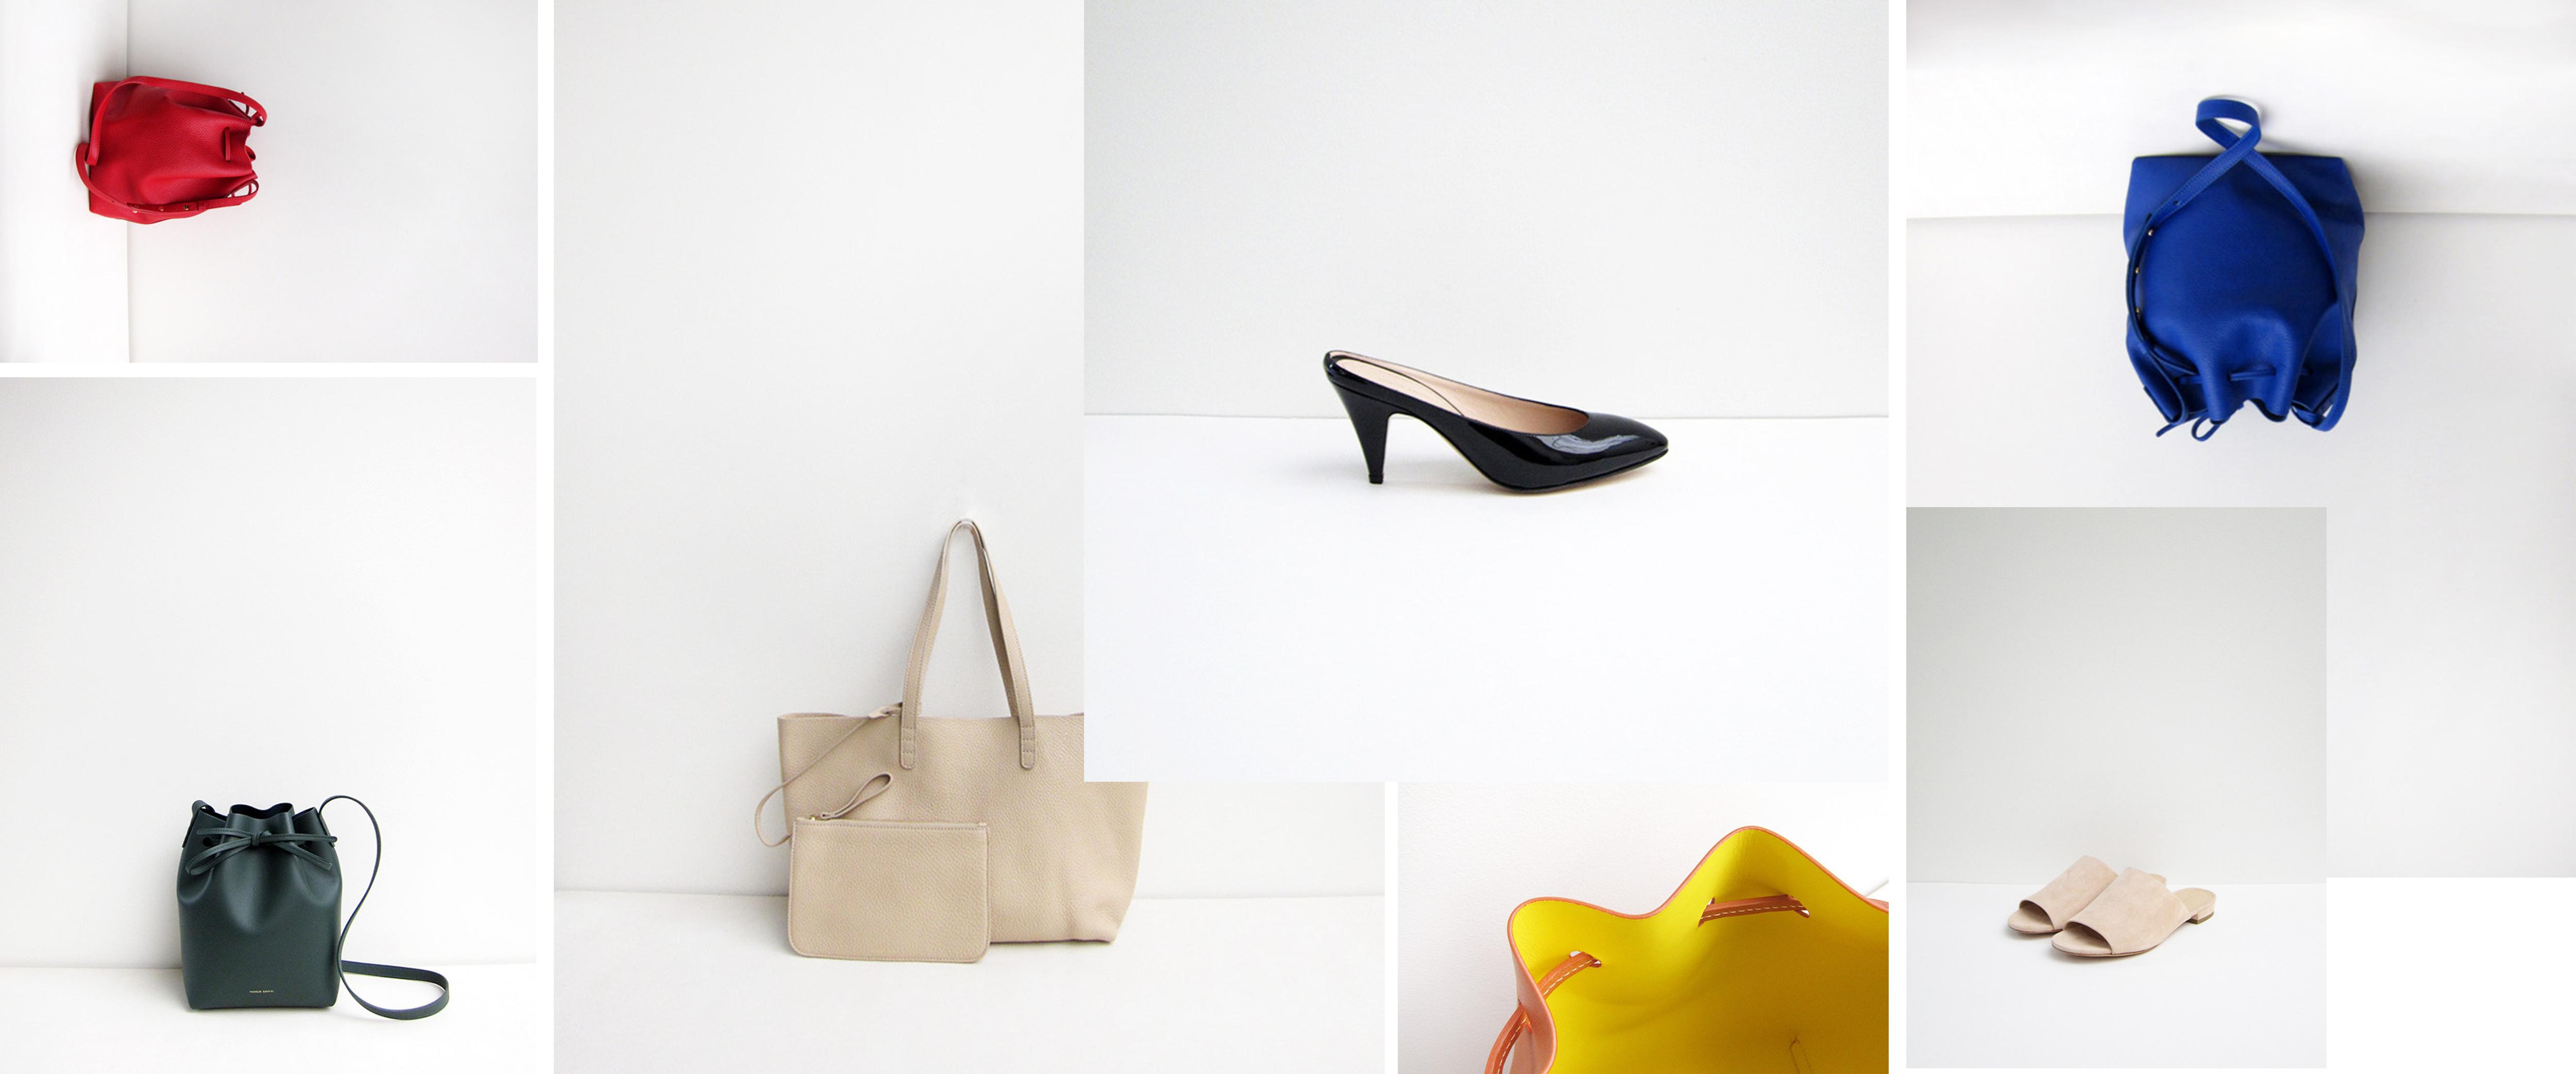 Mansur-gavriel-new-york-designers